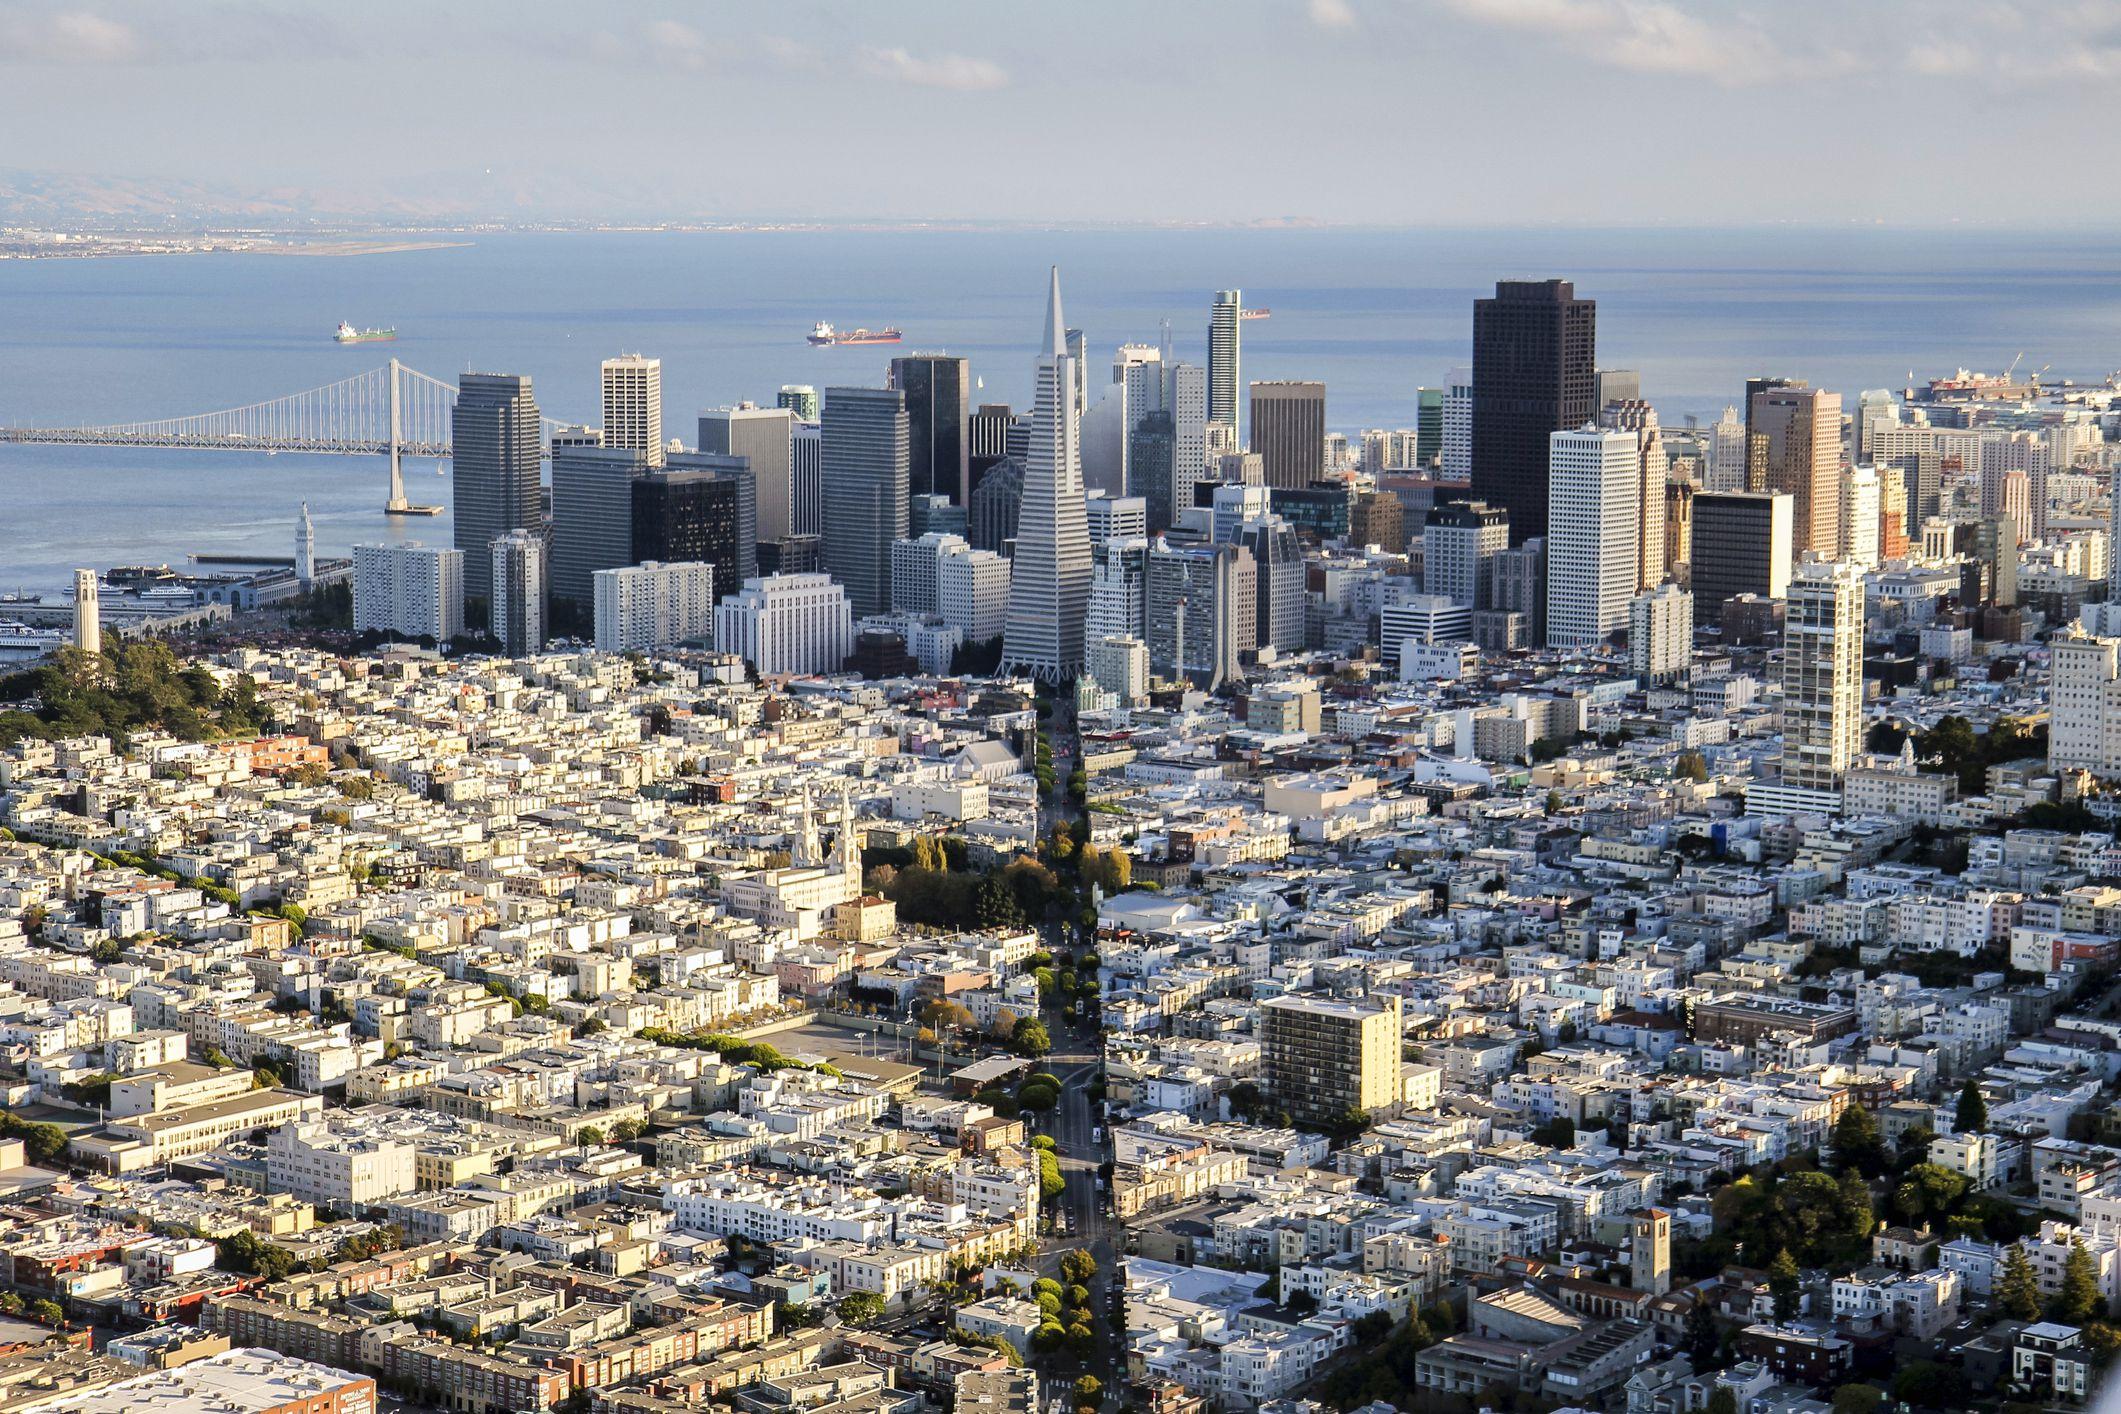 8d203339 Columbus Ave & Downtown San Francisco aerial